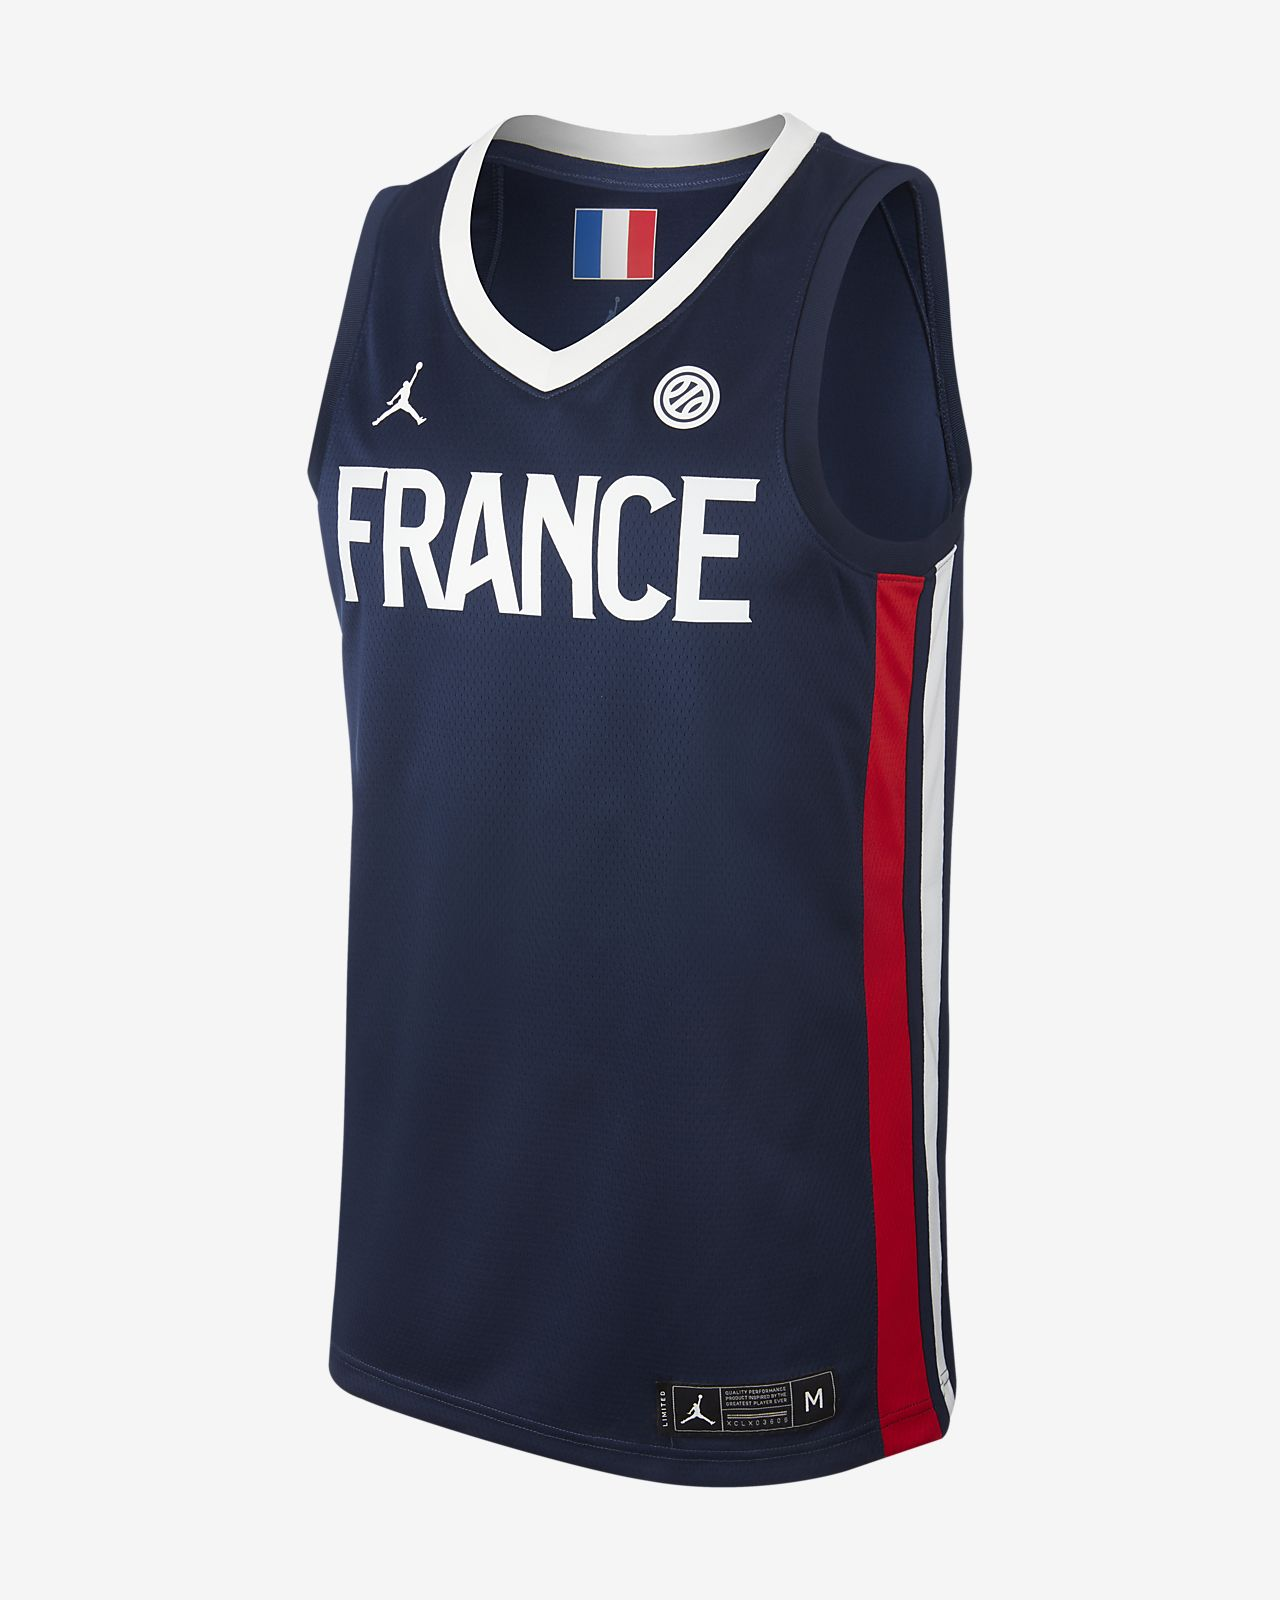 France Jordan (Road) Men's Basketball Jersey